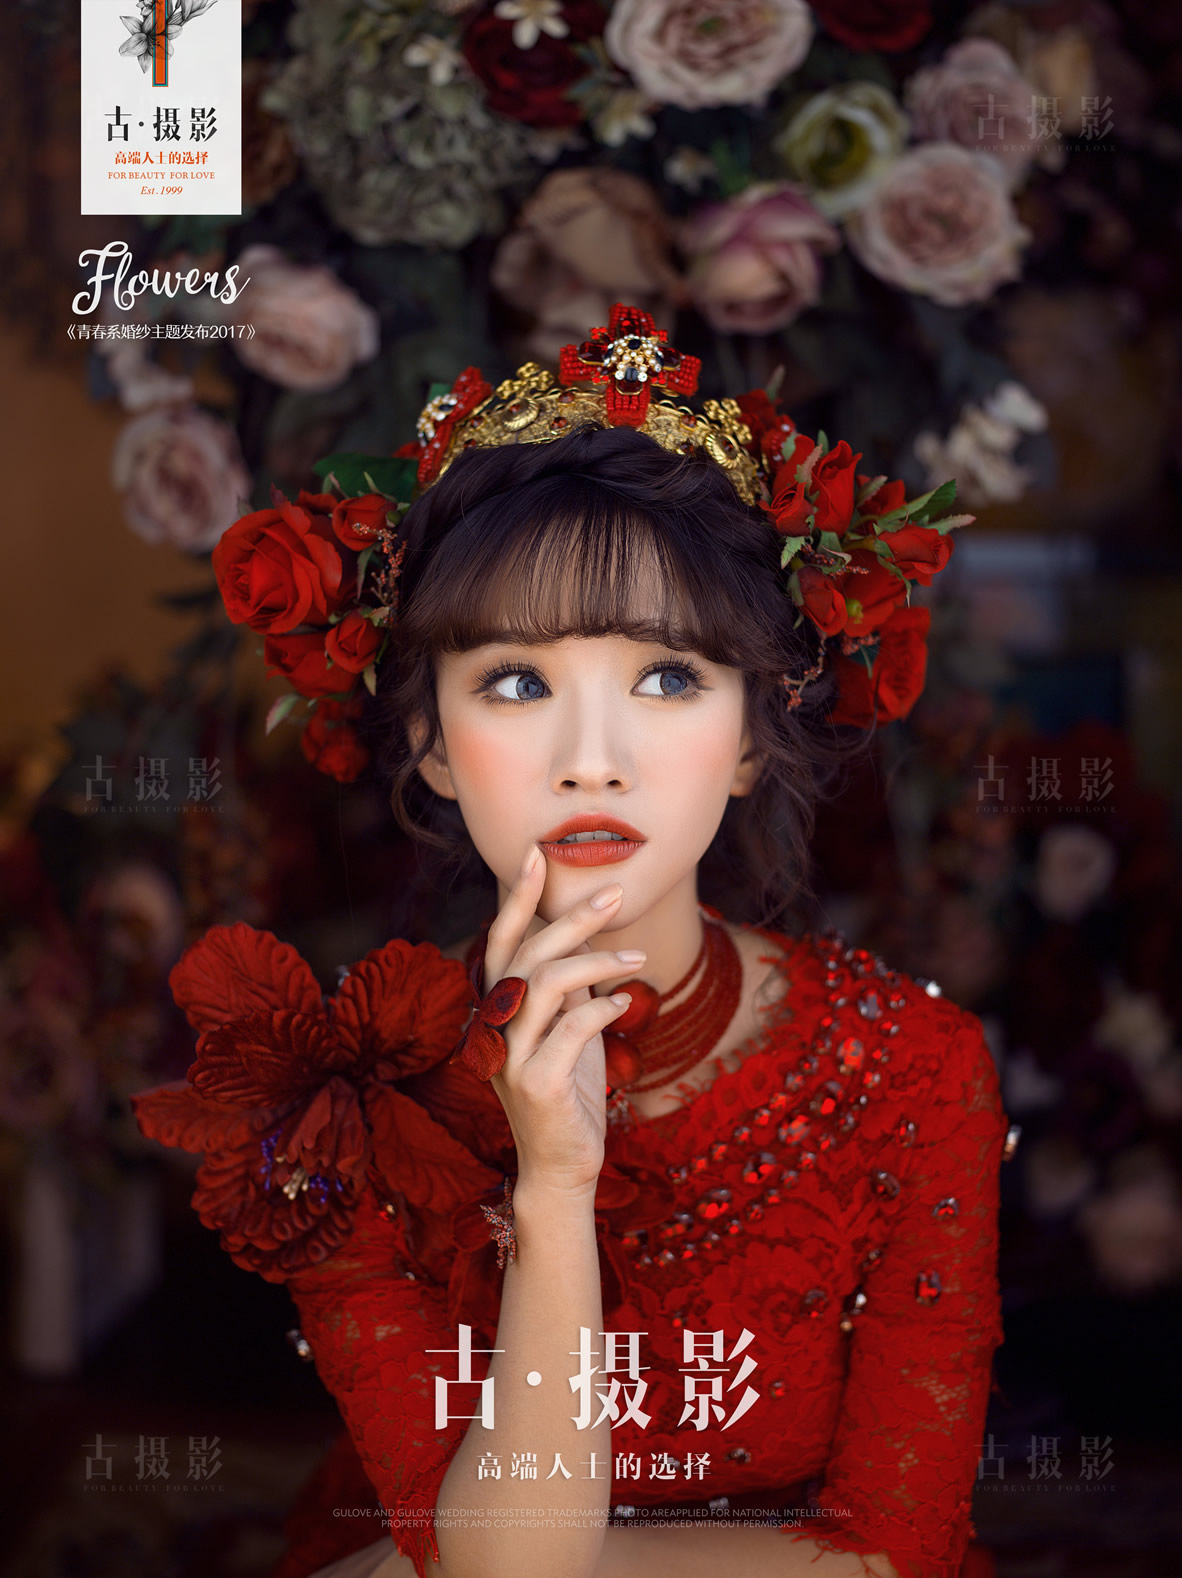 Flowers Red - 明星范 - love上海古摄影-上海婚纱摄影网